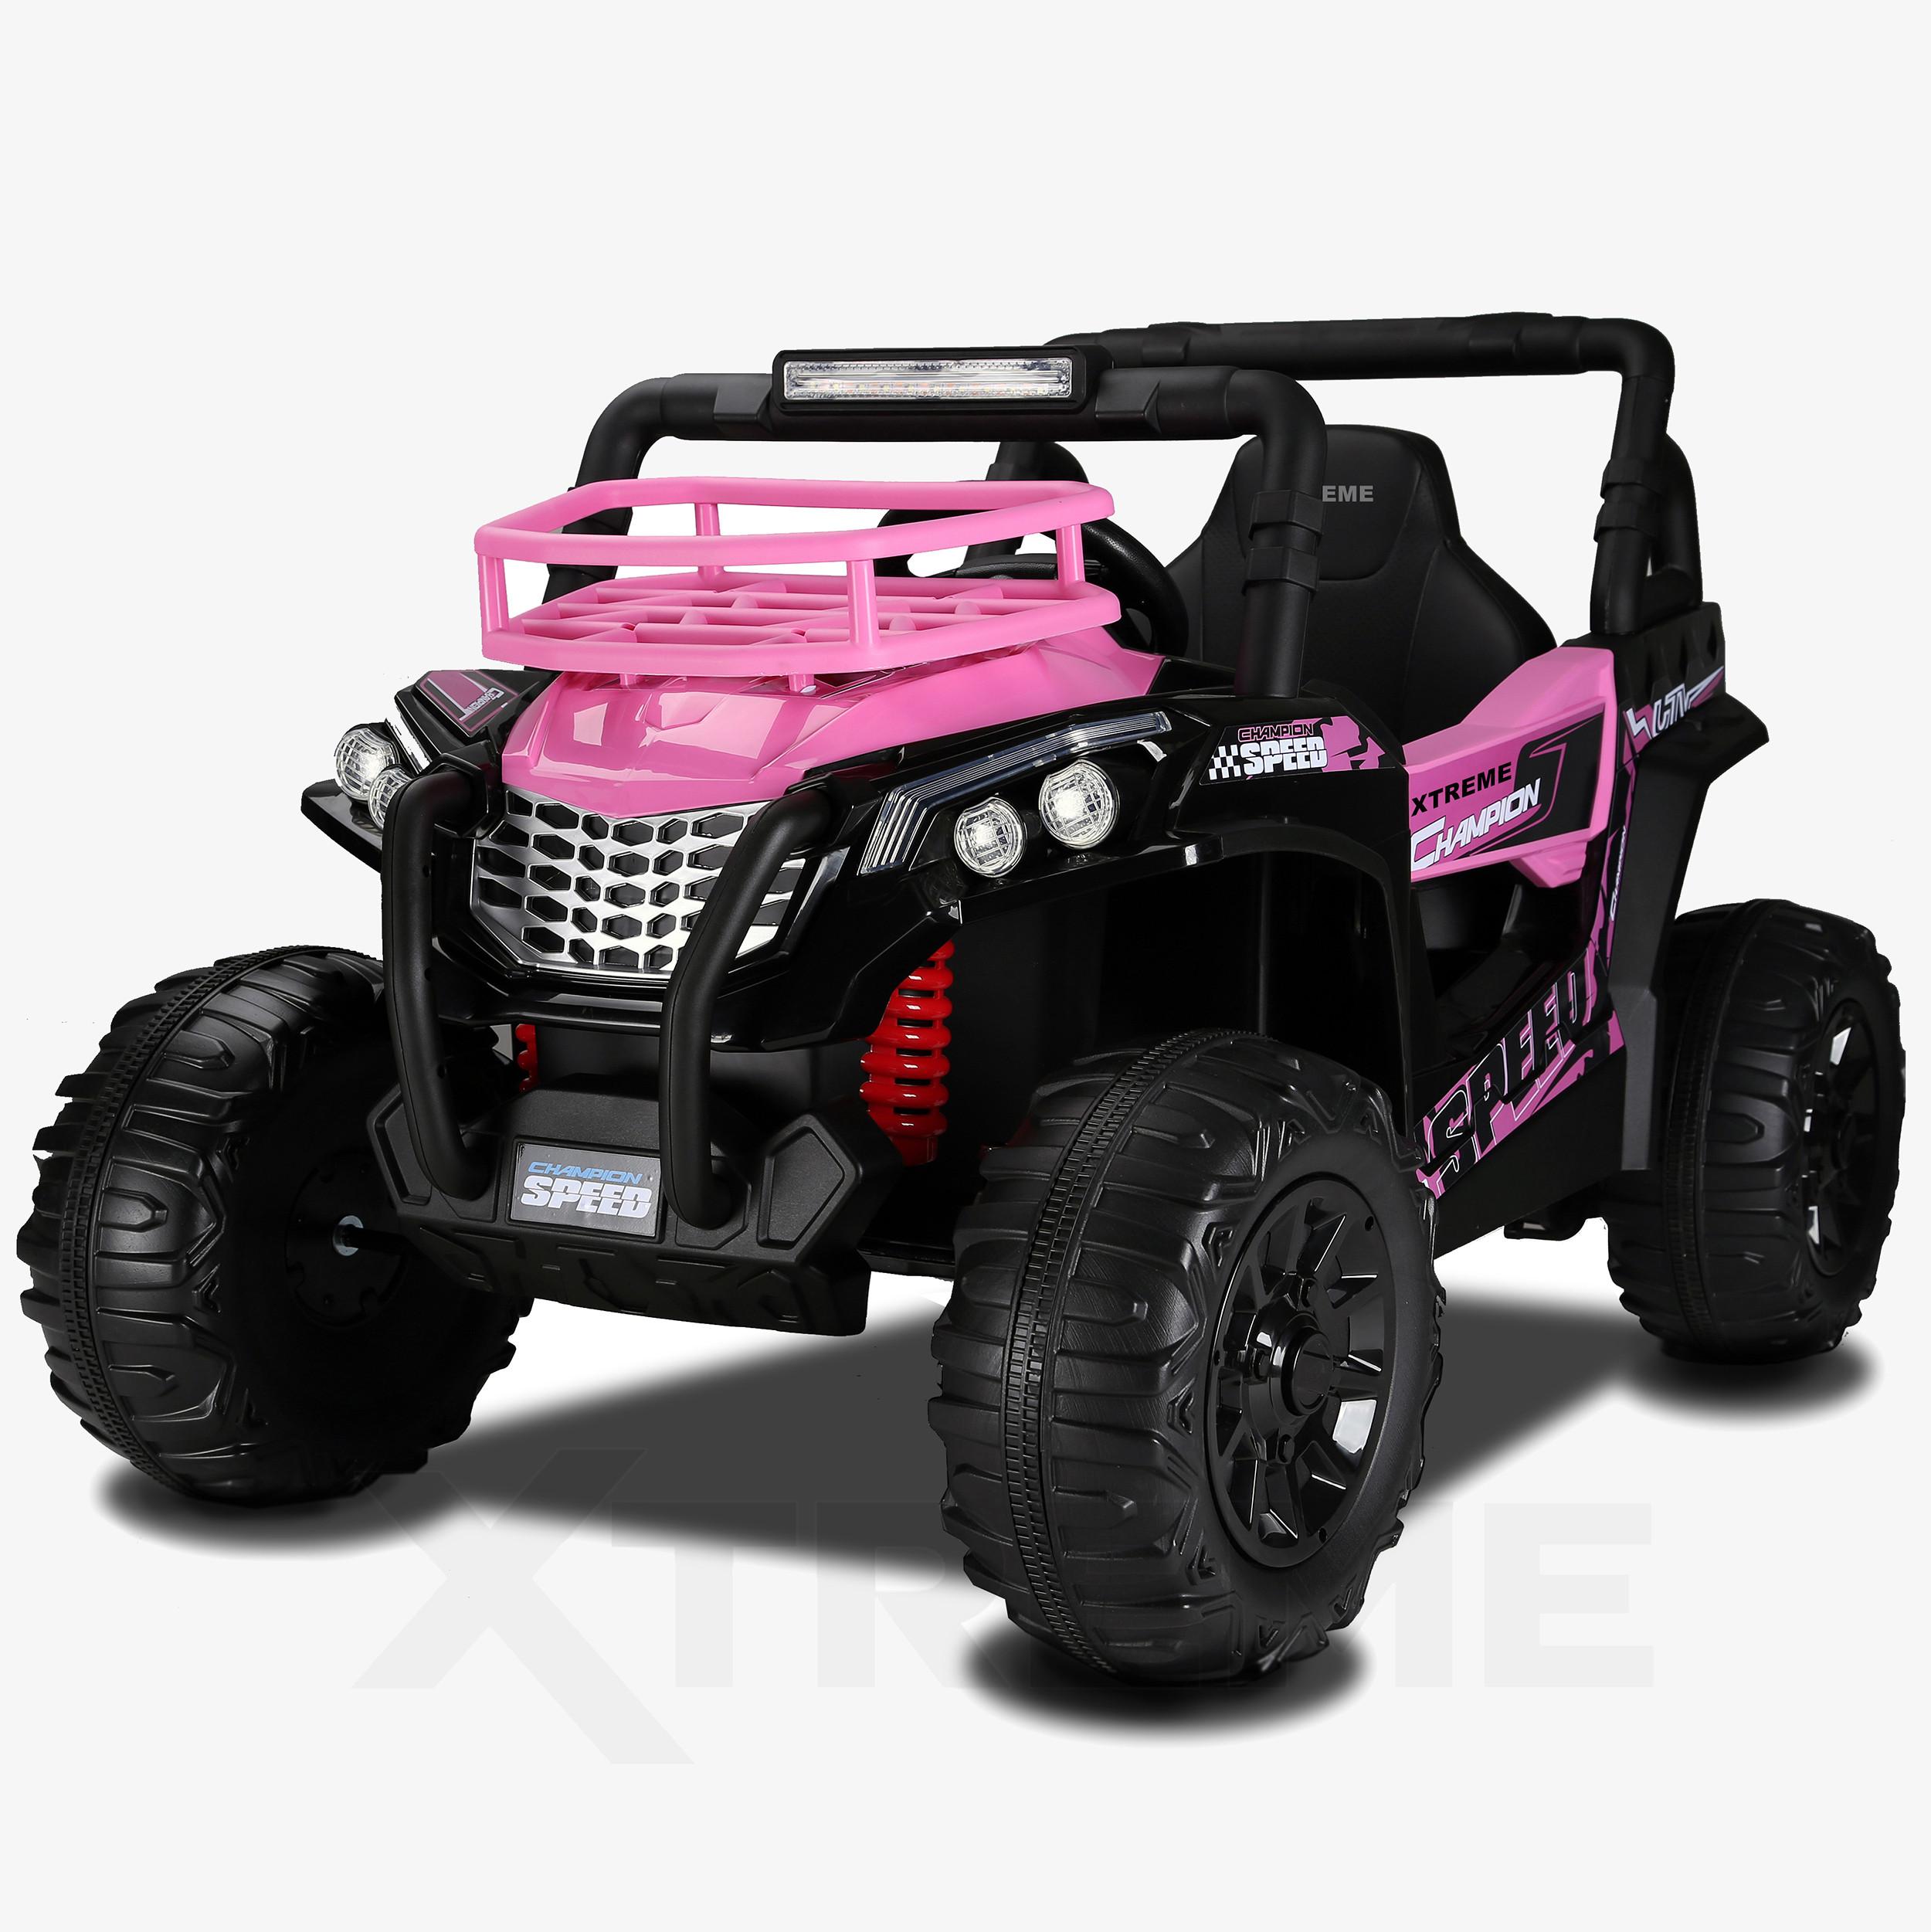 Xtreme BIG 12v Ride on Buggy Off Road UTV Jeep Pink